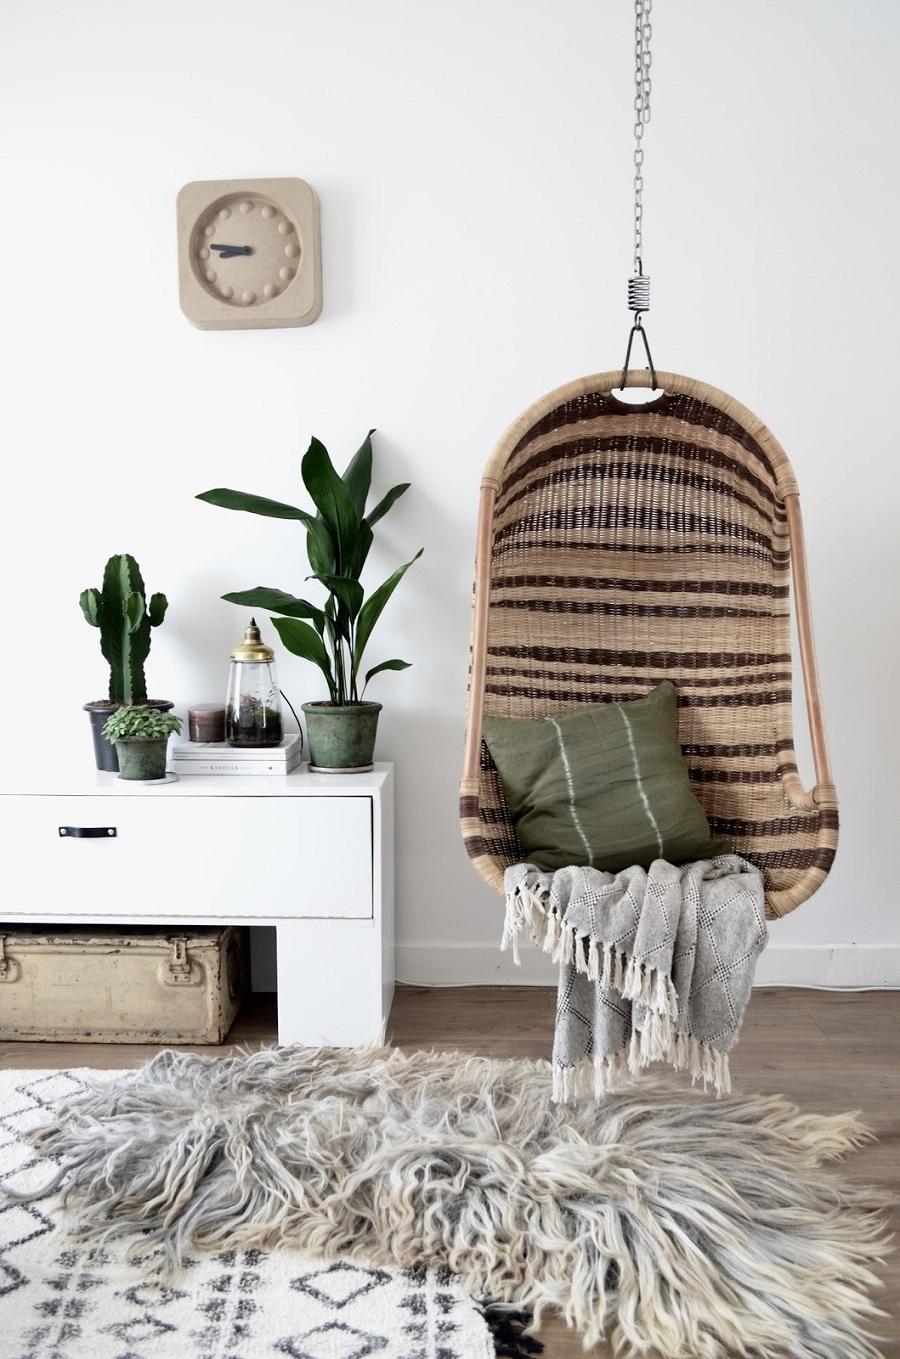 ghế treo đan sợi